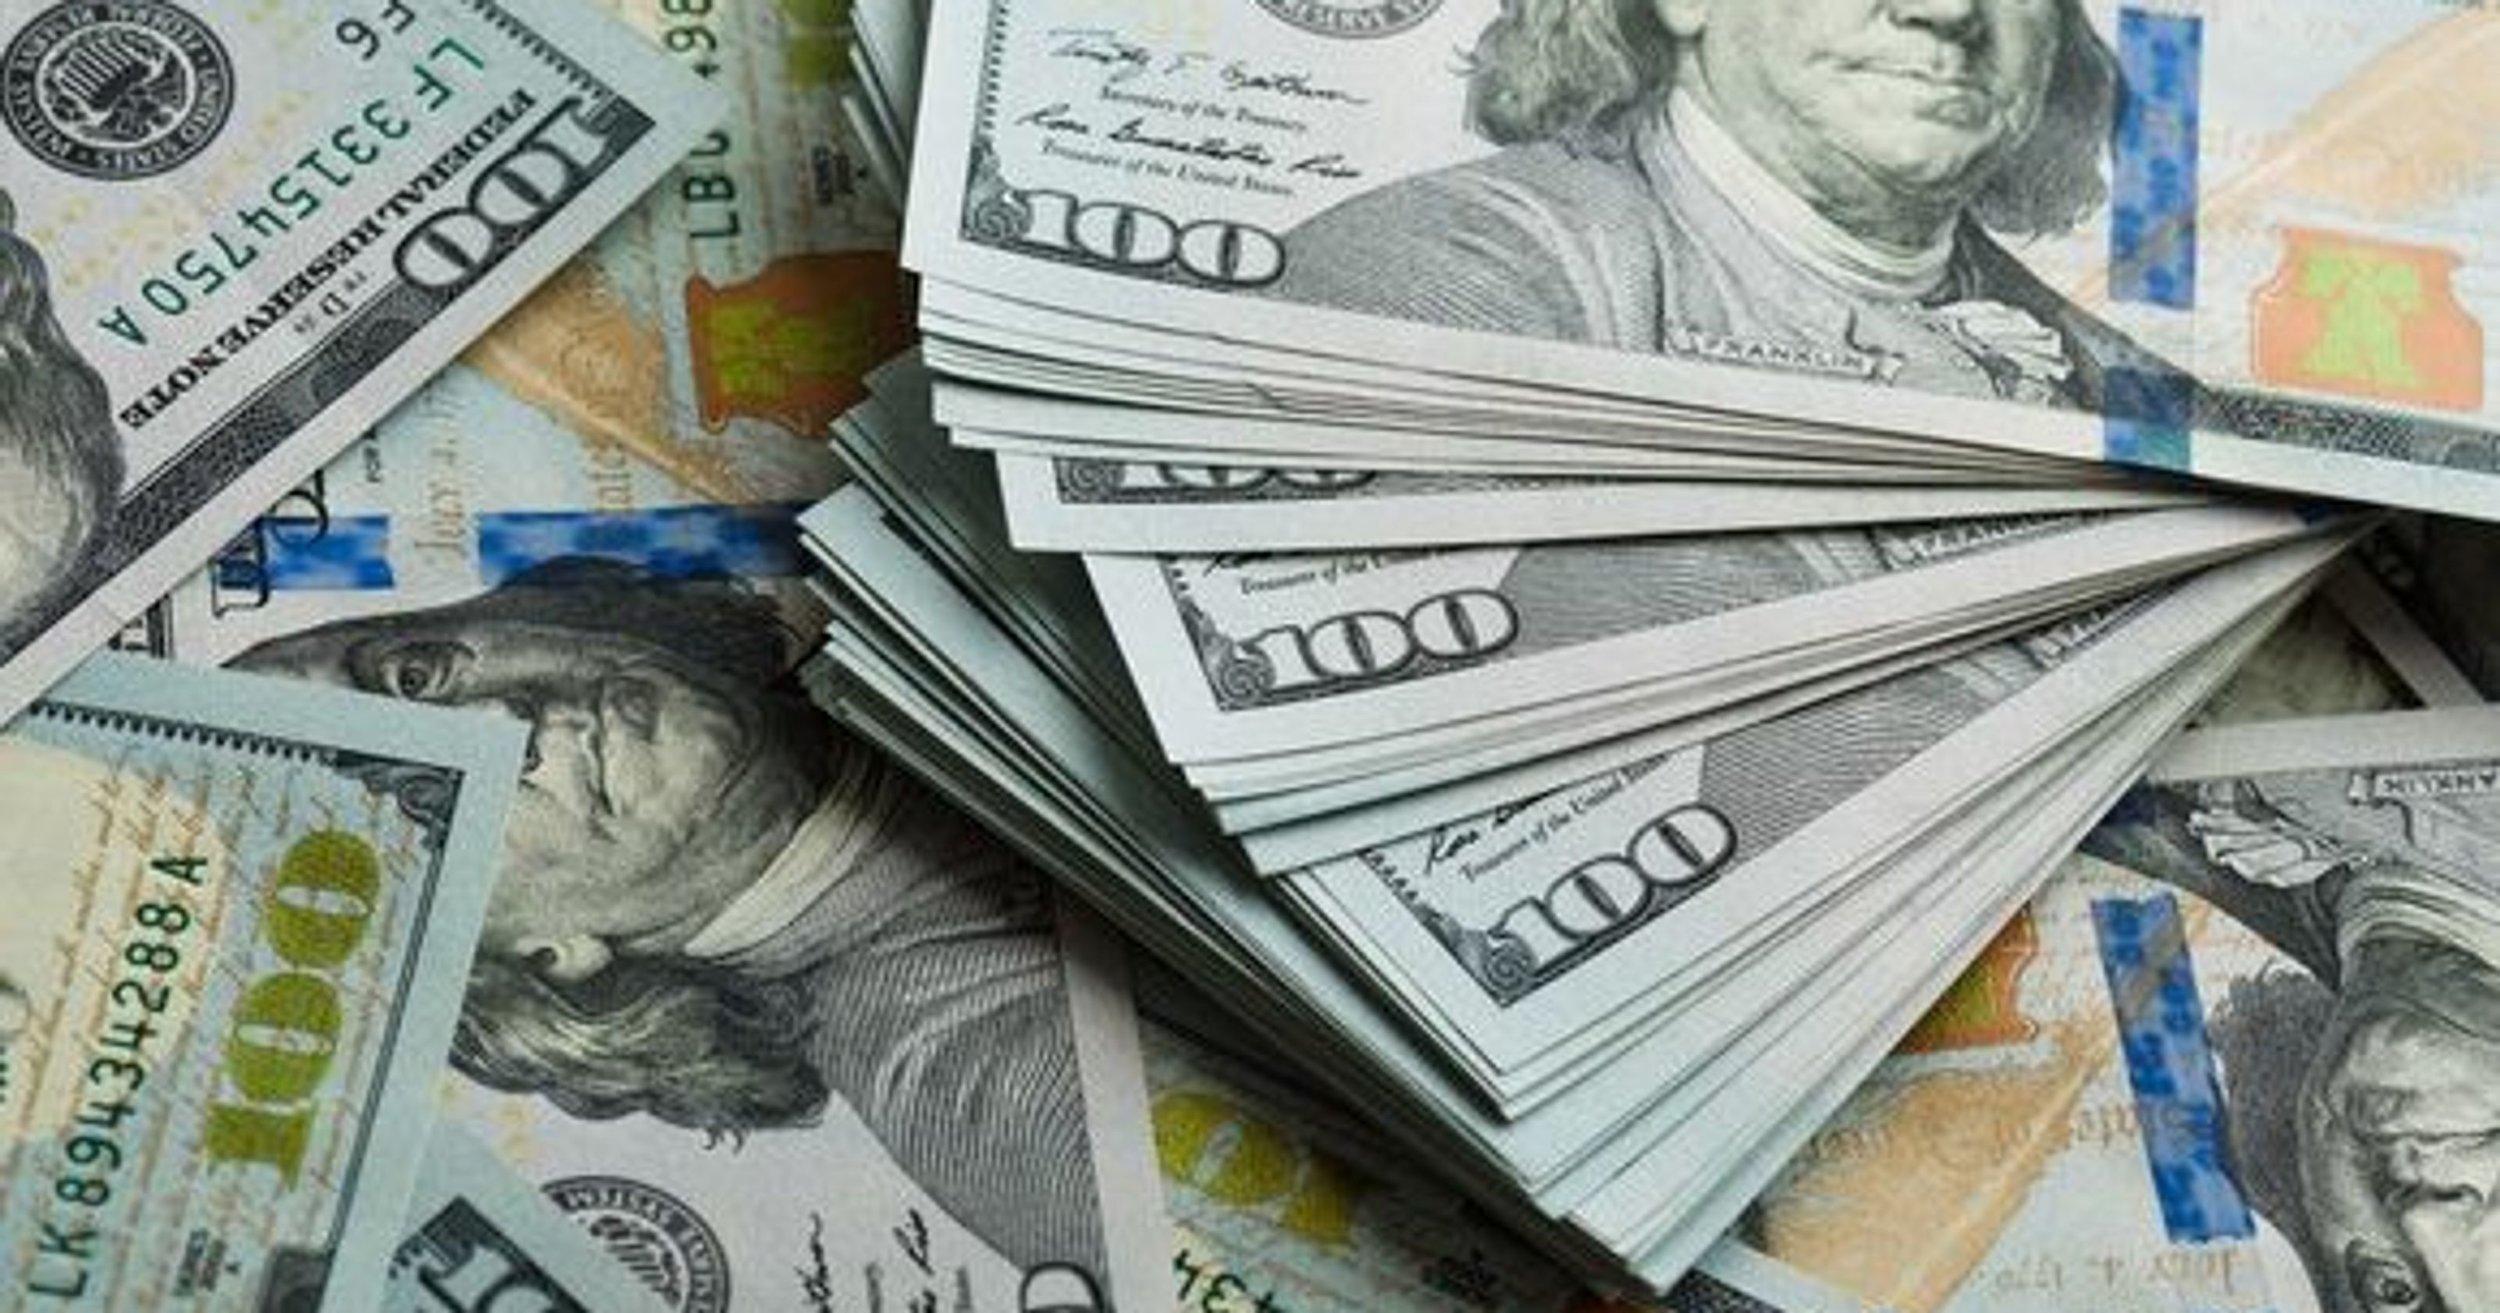 large-pile-of-hundred-dollar-bills-cash-money-savings-rich_large.jpg